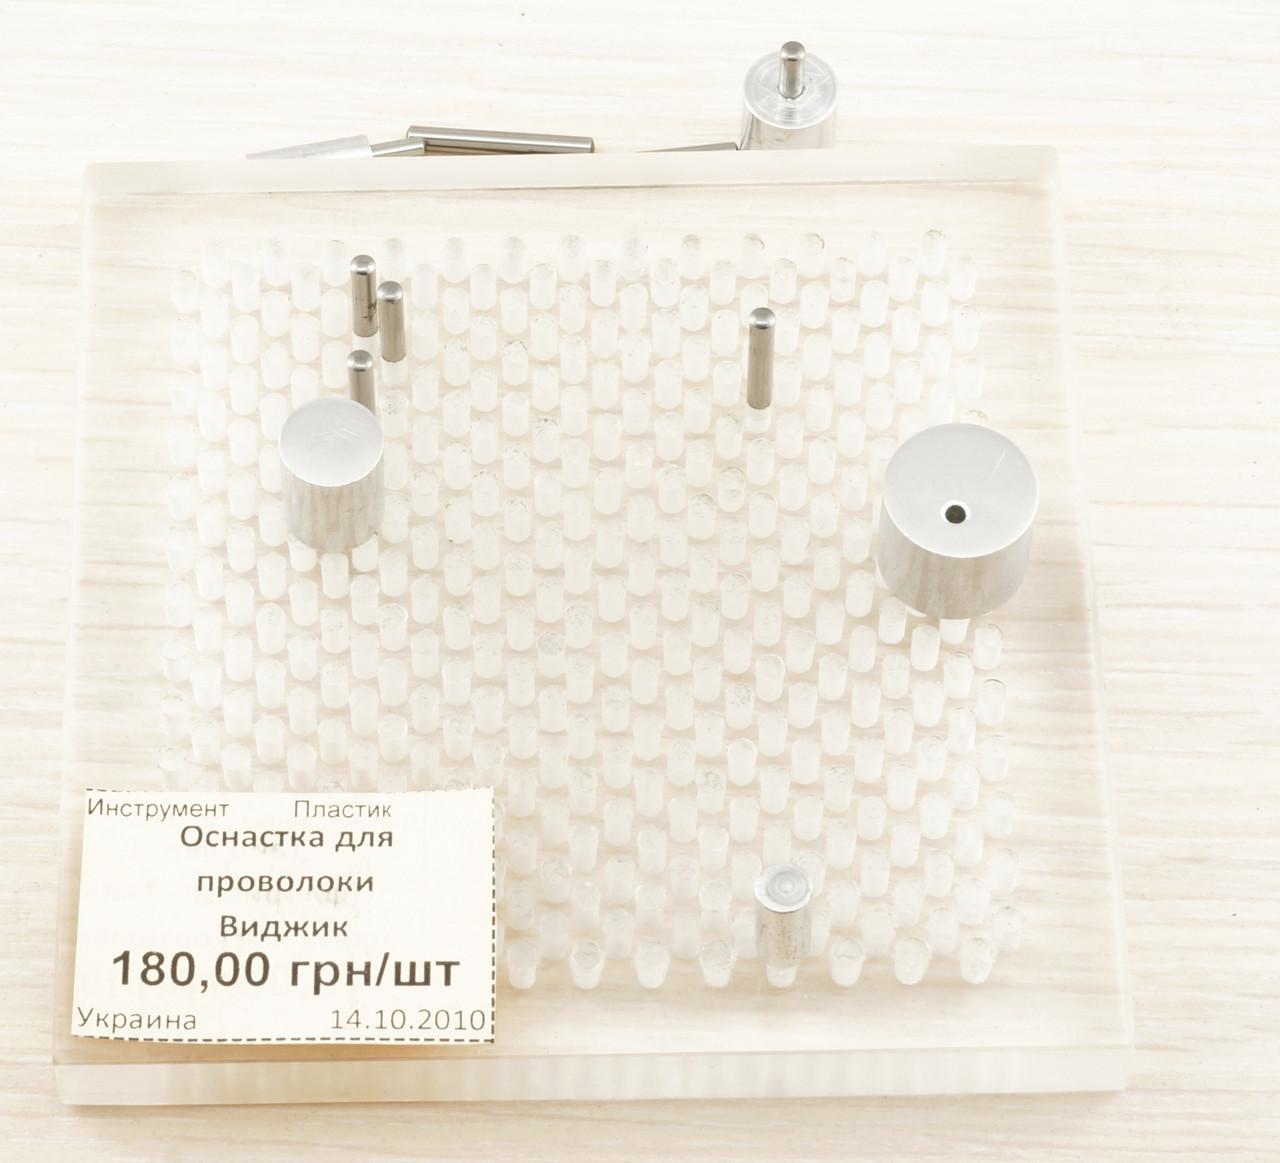 Оснастка для проволоки Виджик (товар при заказе от 200 грн) - магазин-студия Цацки в Чернигове